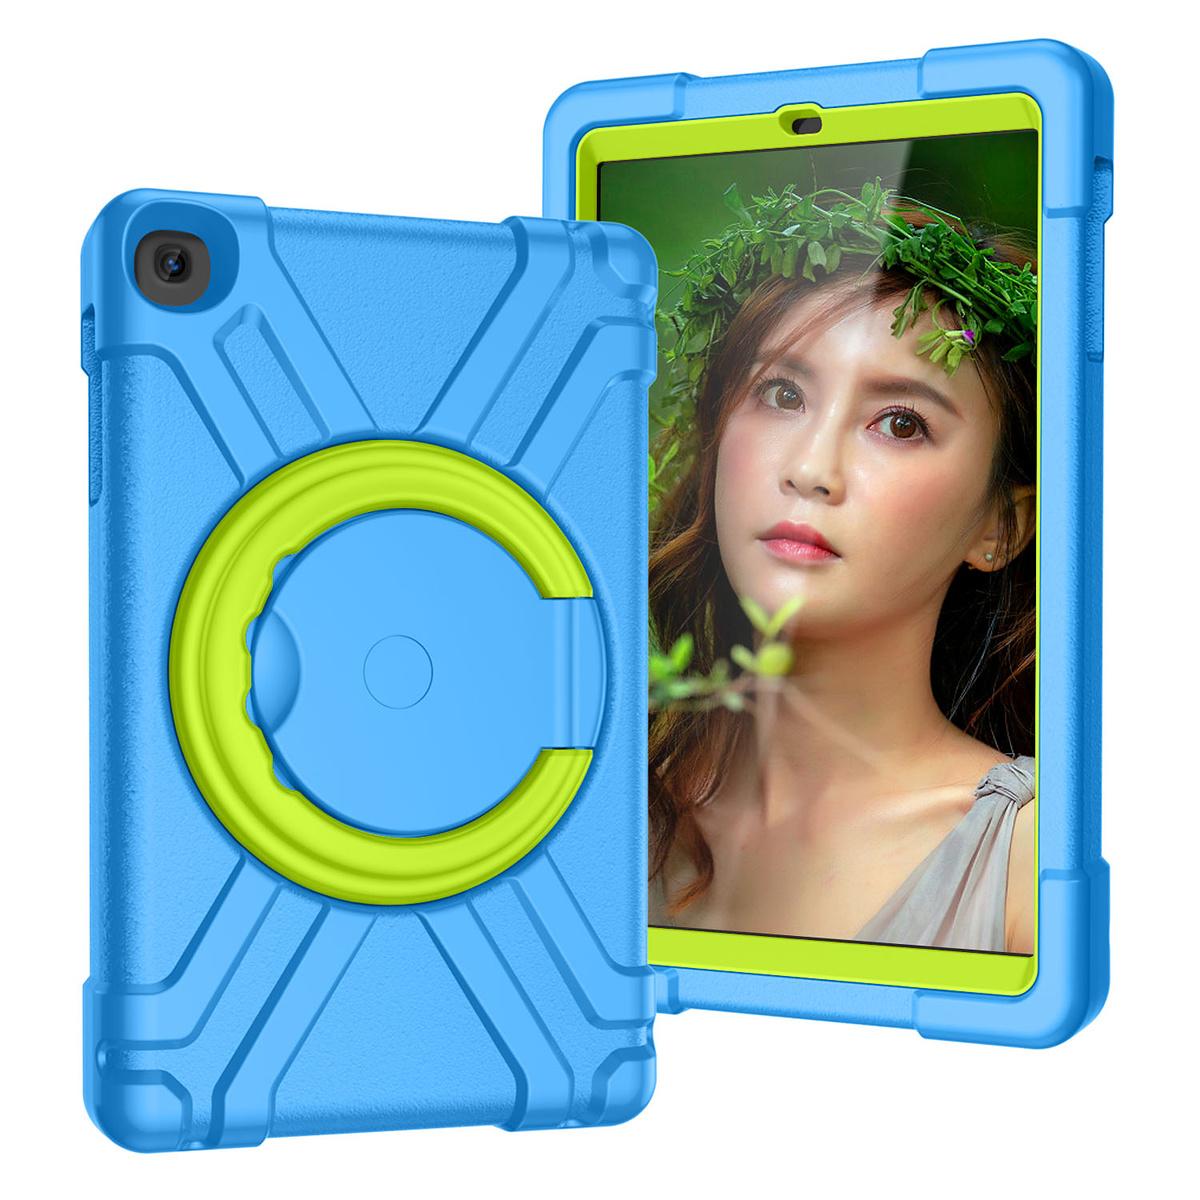 Barnfodral, Samsung Tab A 10.1 (2019), blå/grön